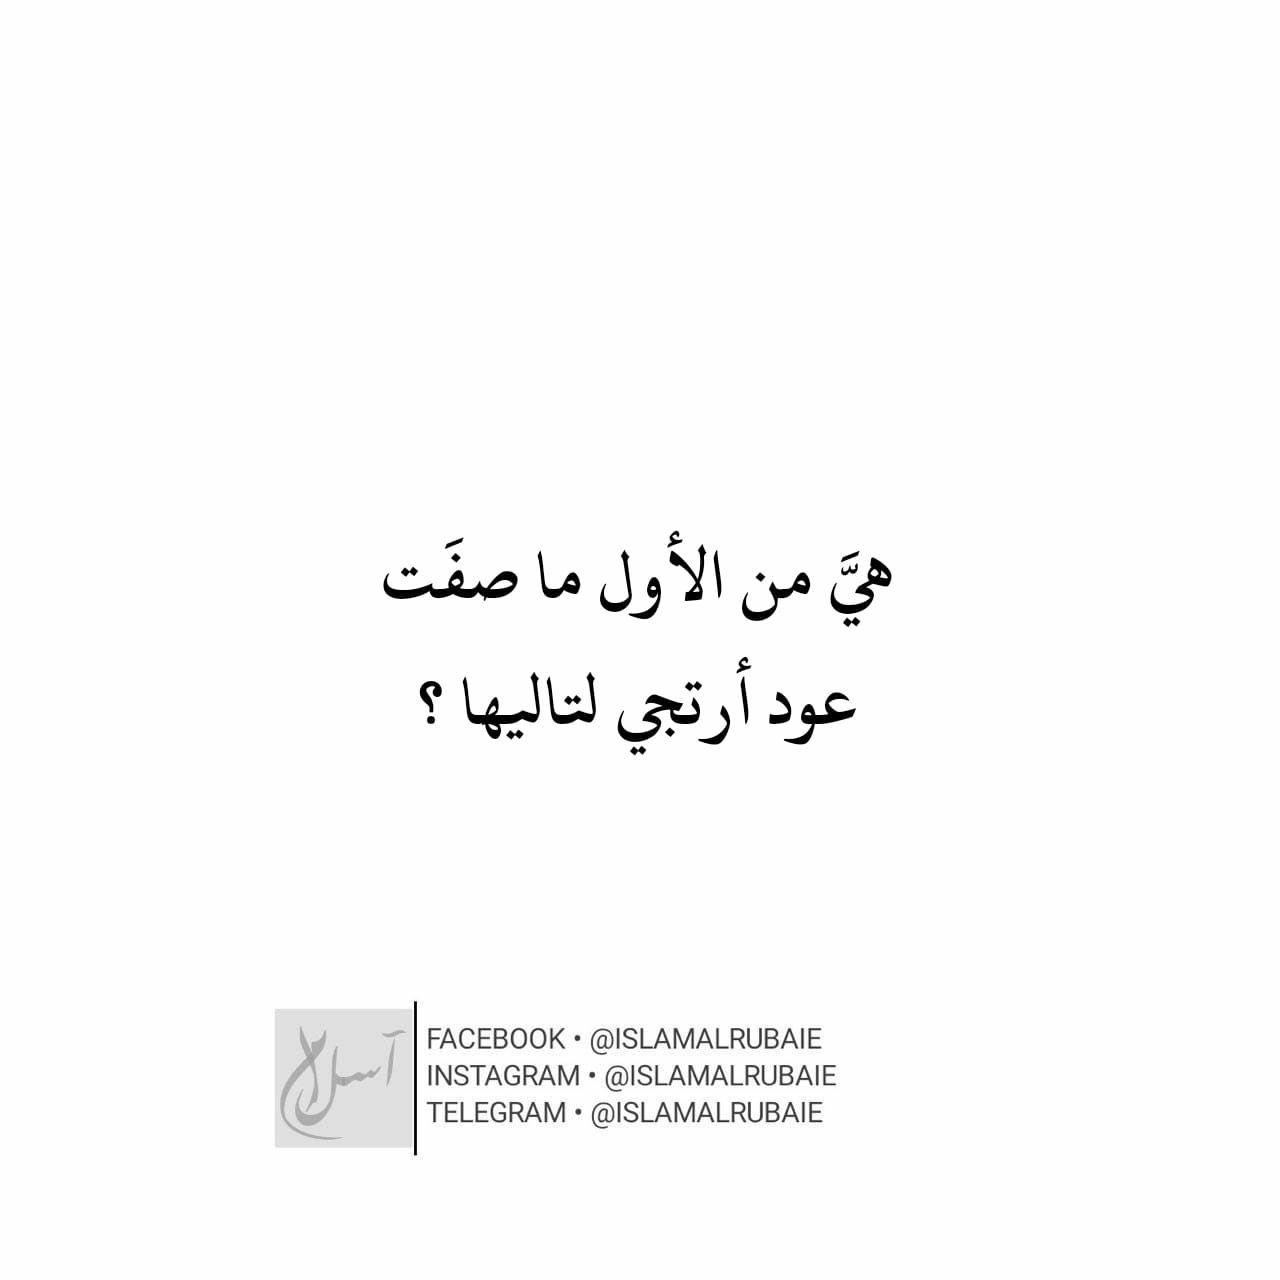 اجمل شعر شعبي عراقي غزل Love Quotes Arabic Quotes Crying Aesthetic